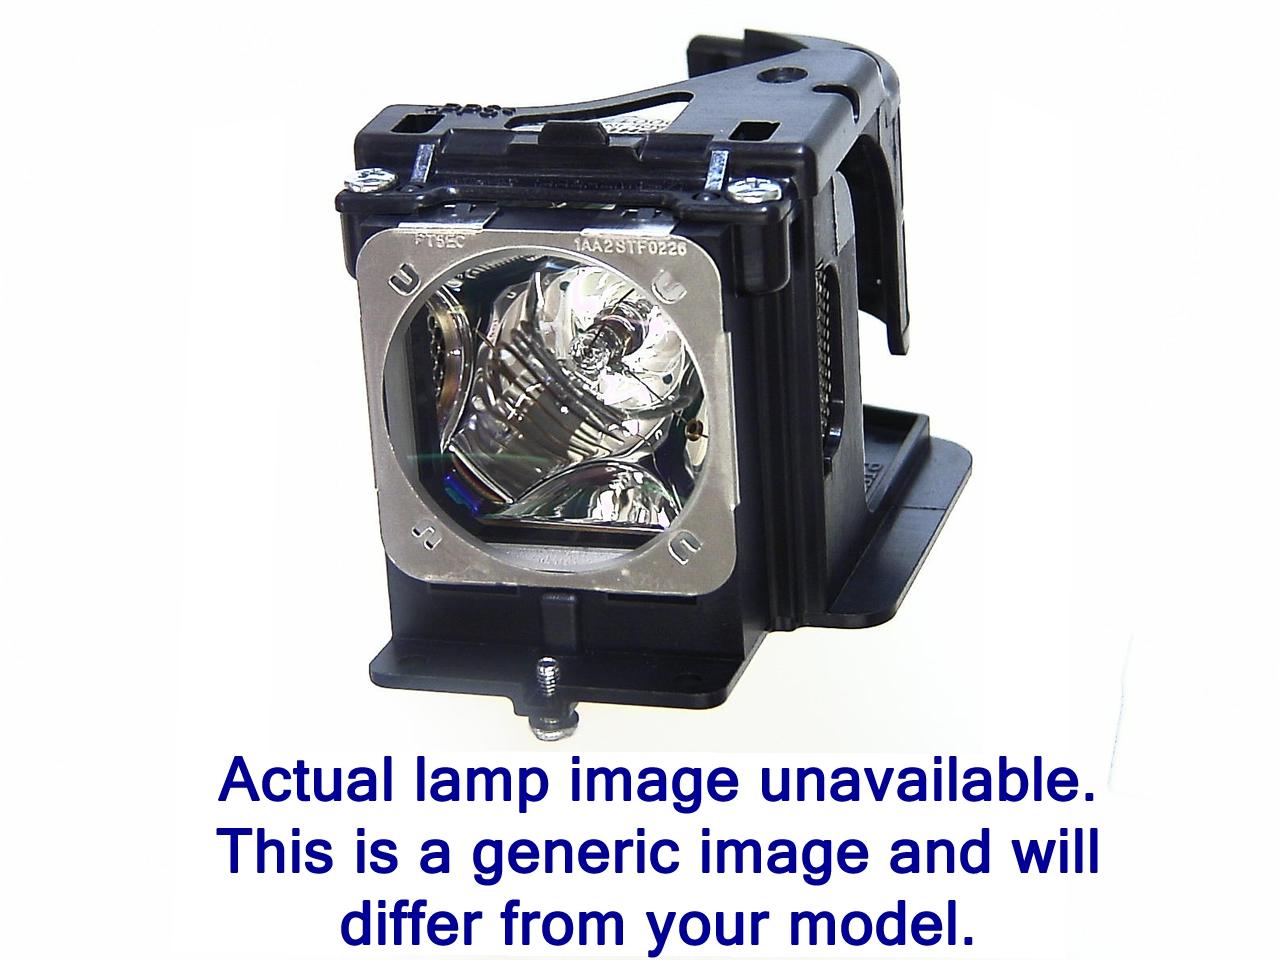 Diamond Lámpara For 3M MP8765 Proyector.